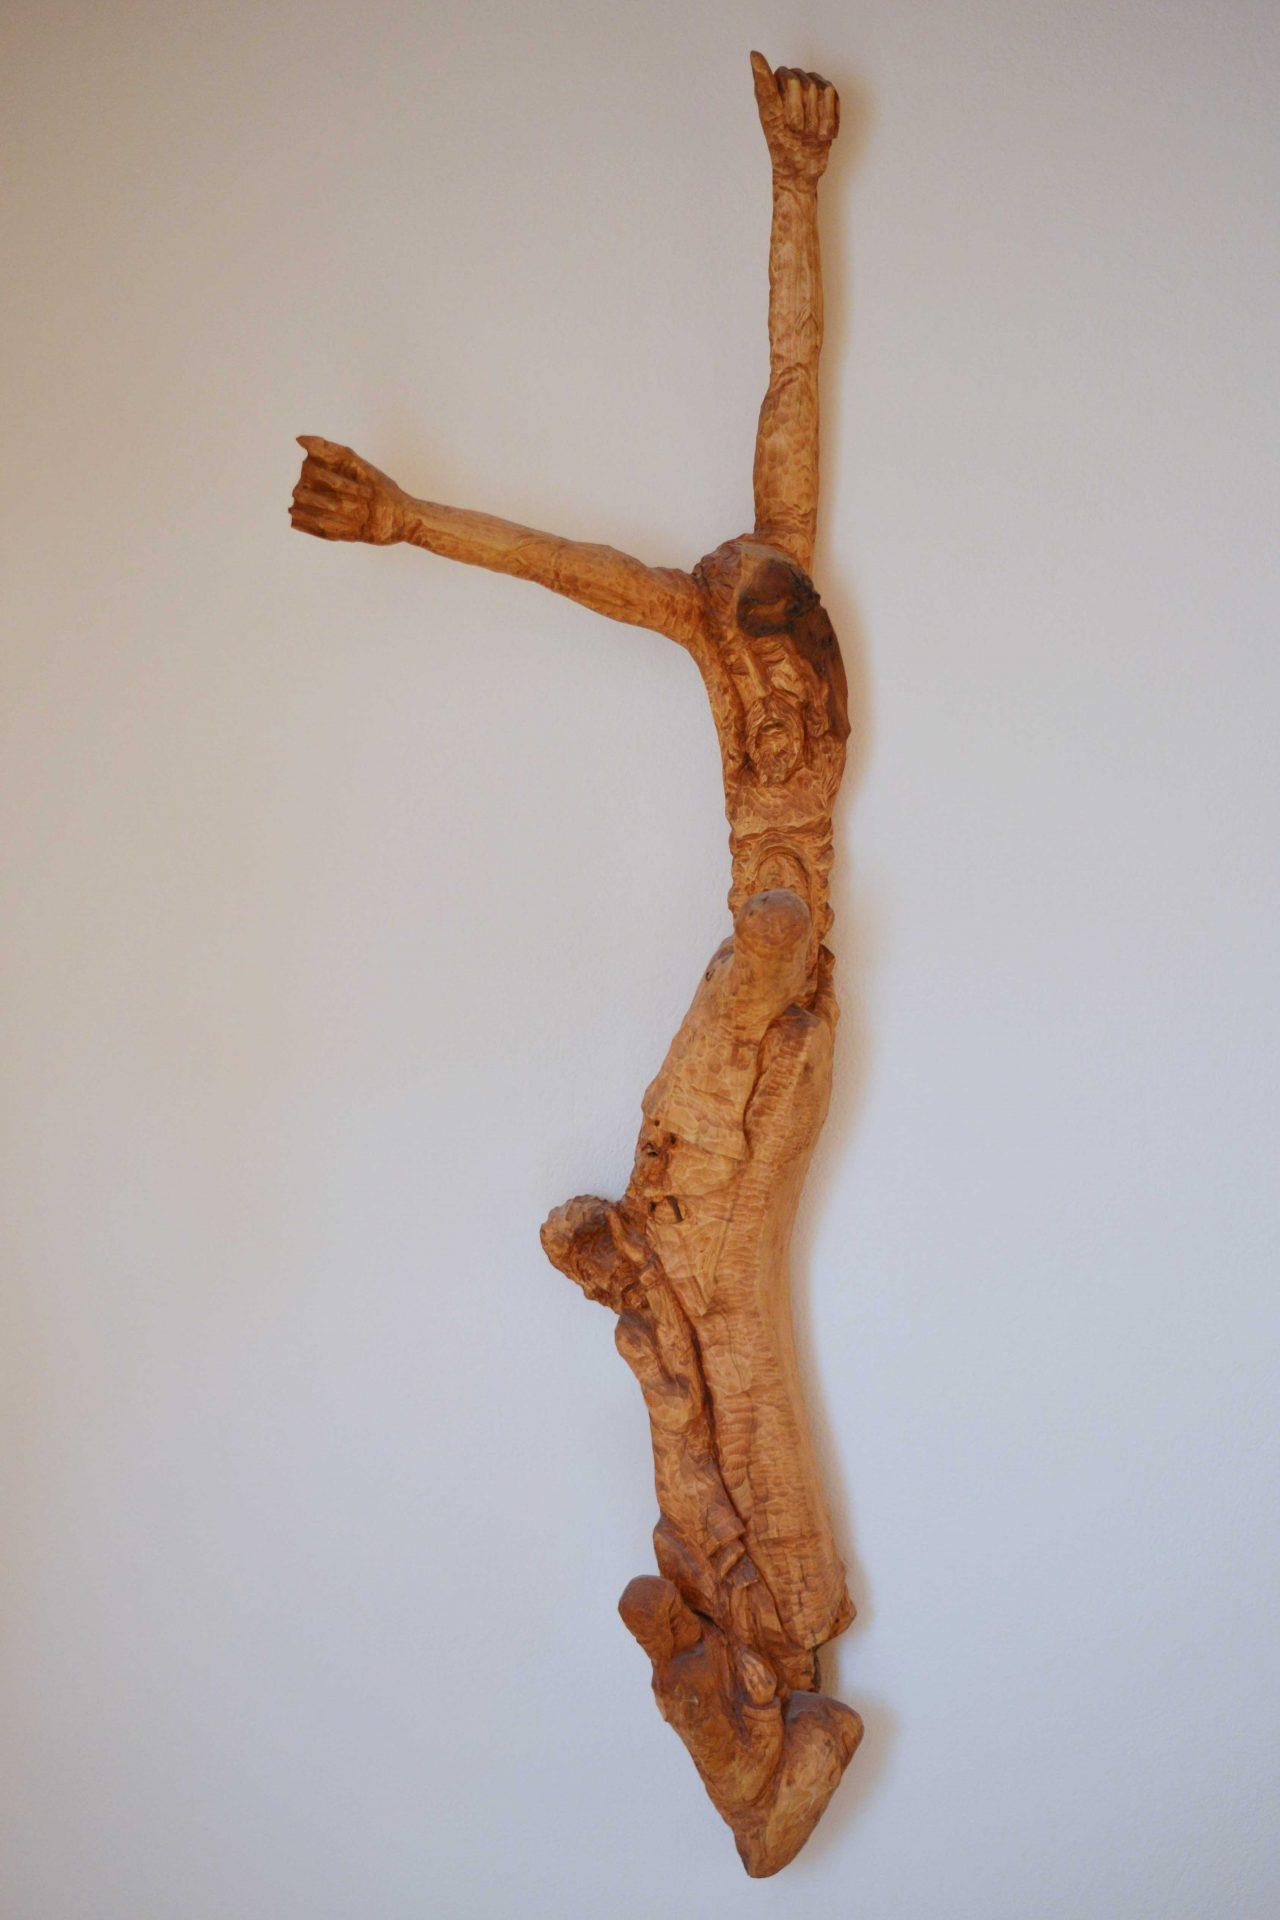 drevena-socha-umenie-drevorezba-jezis-kristus